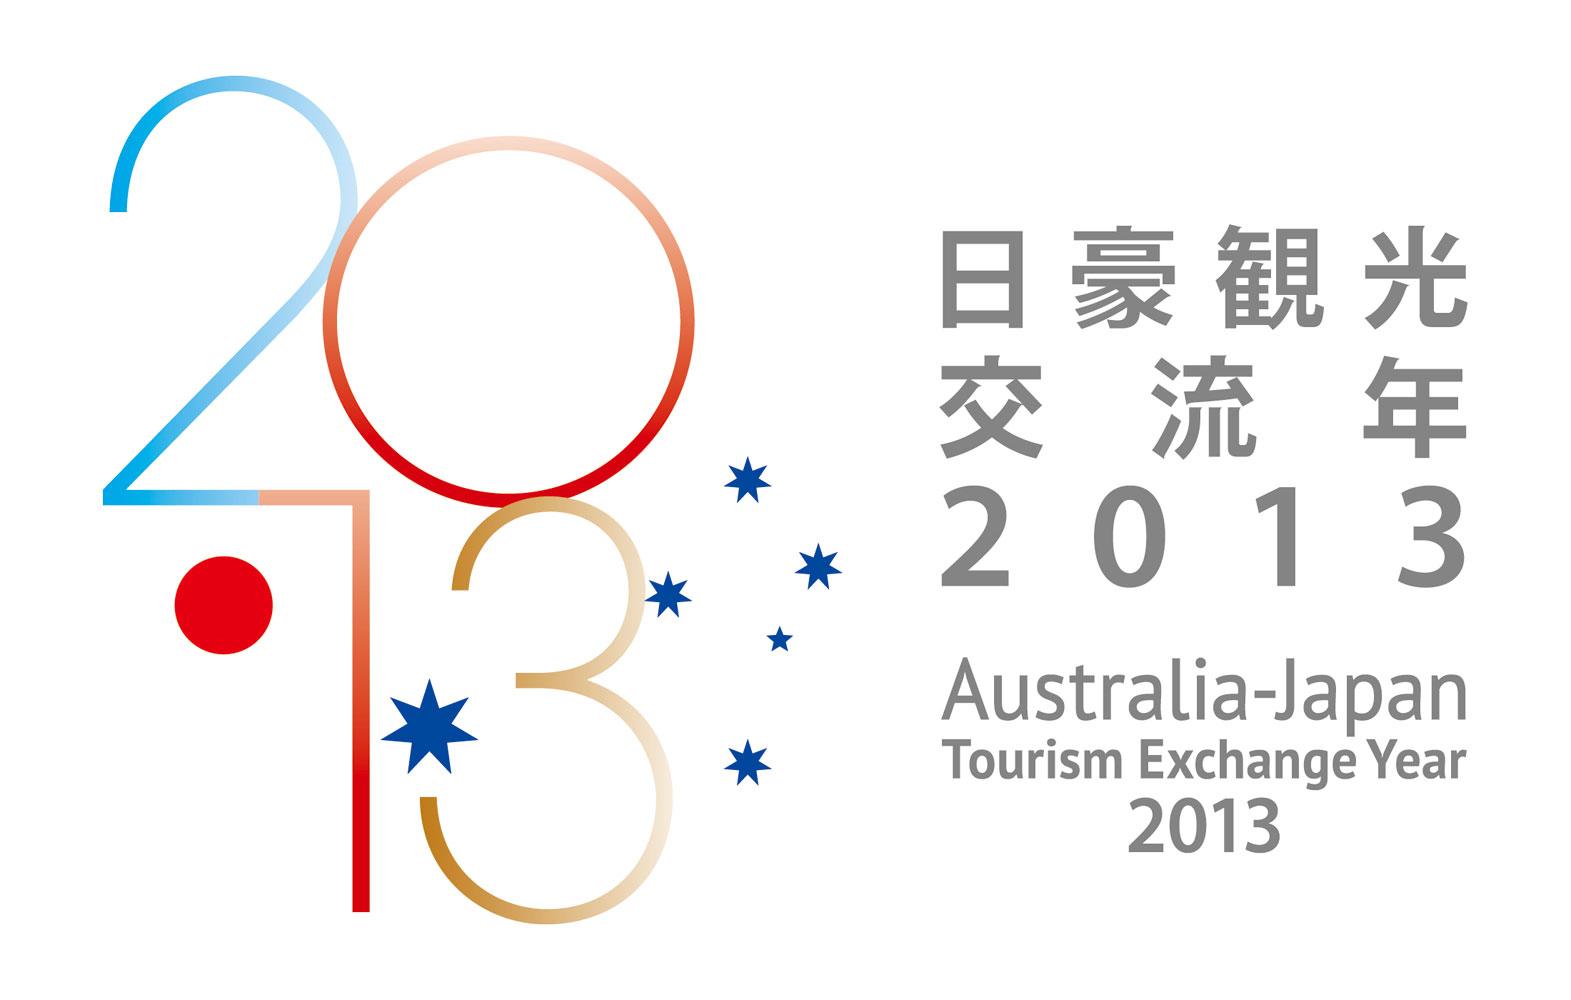 JNTOとオーストラリア政府観光局、13年を日豪観光交流年に、相互交流65万人めざす